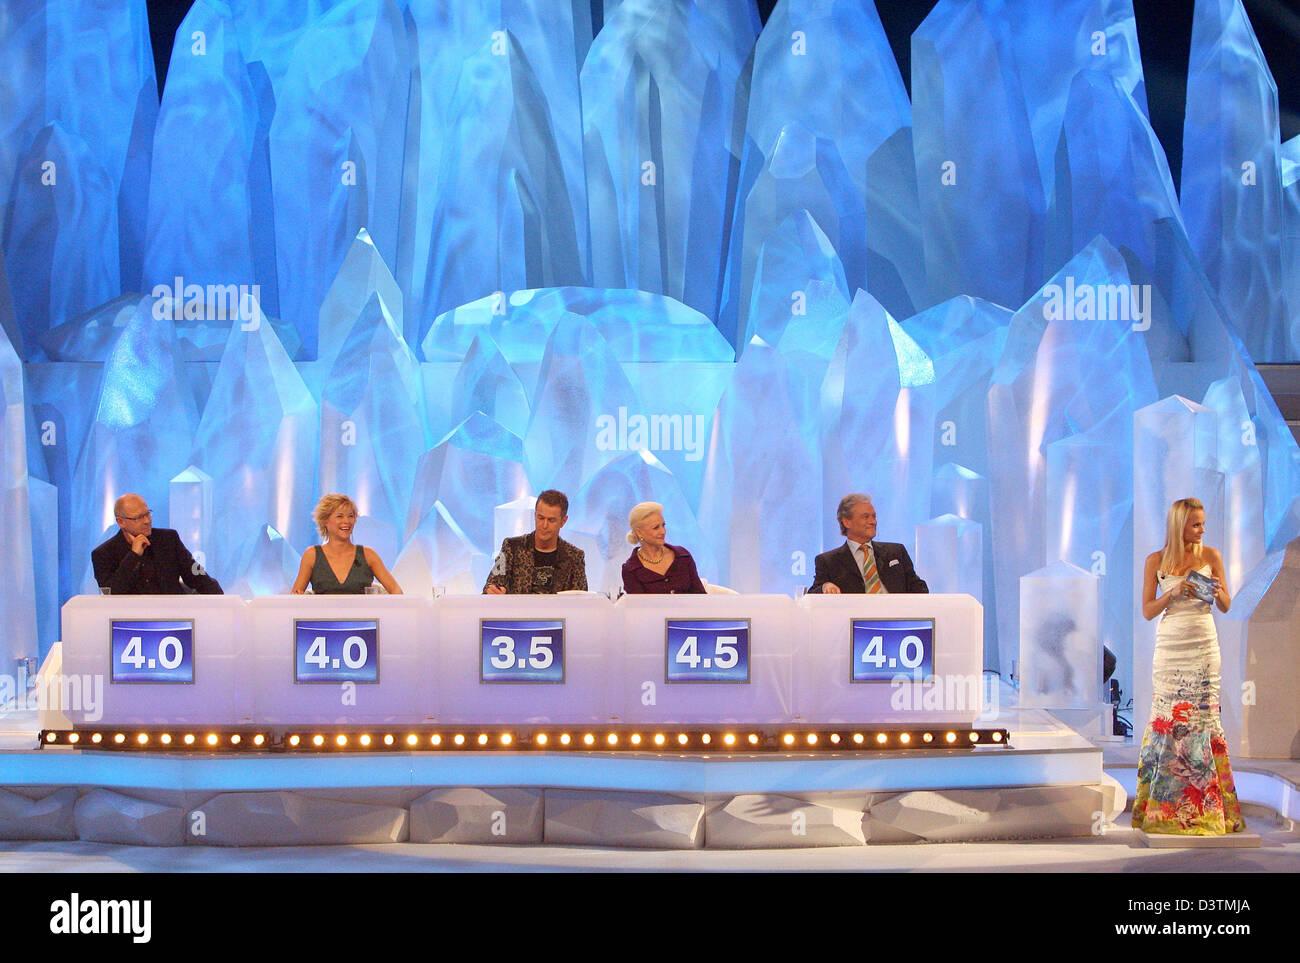 jury dancing on ice